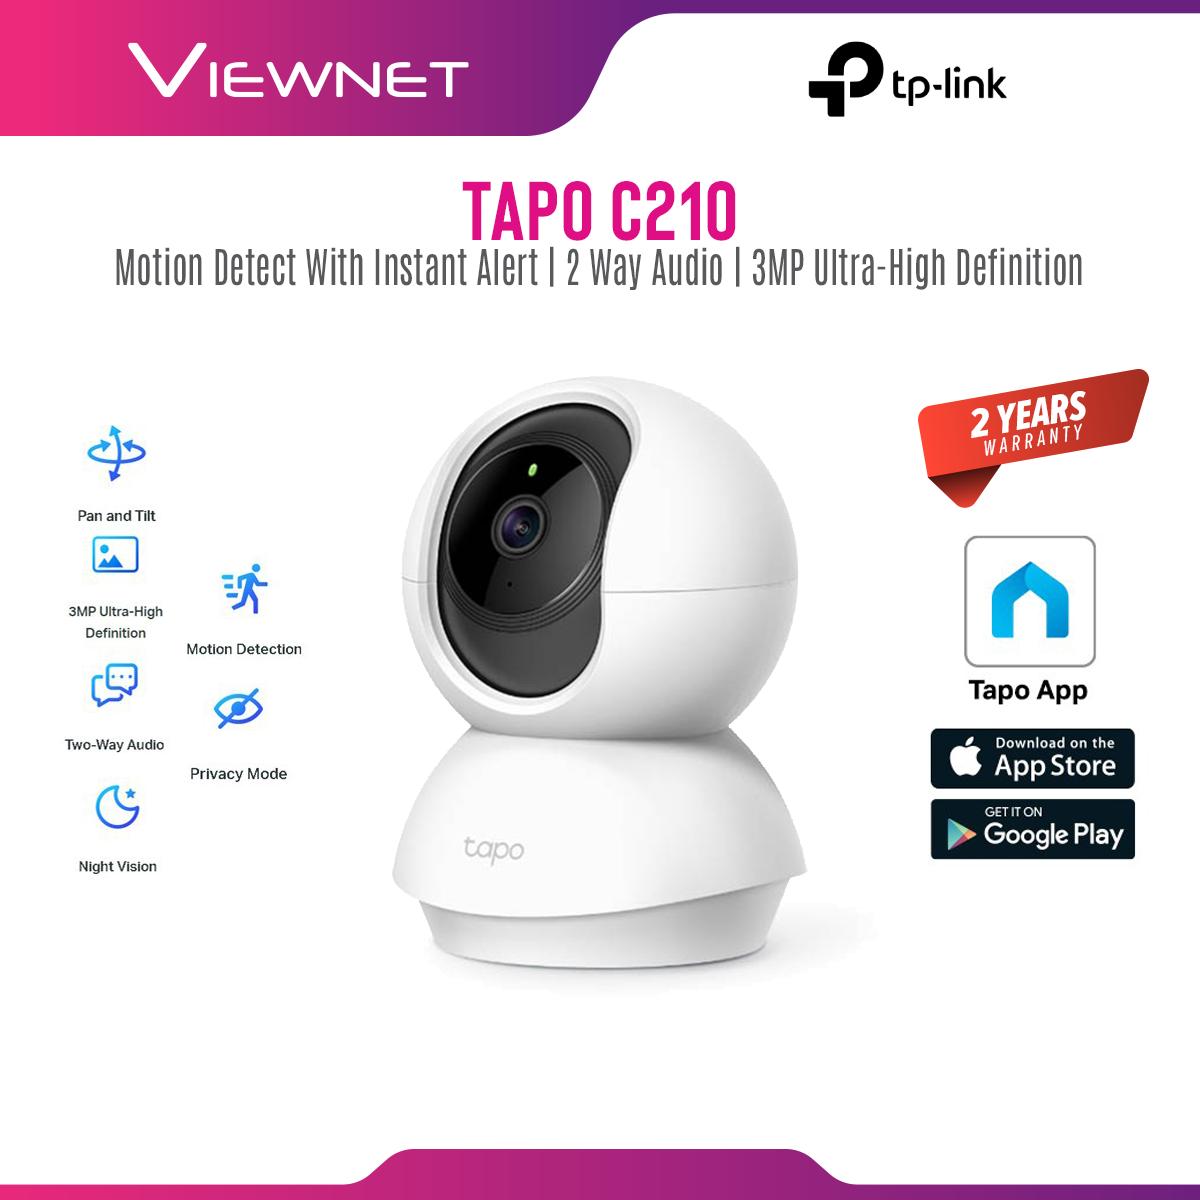 [ONLINE EXCLUSIVE 💥] TP-Link TAPO C210 3MP SUPER HD / TAPO C200 / TC70 1080P Full HD - Pan Tilt Wireless WiFi Home Security Surveillance IP Camera (CCTV)